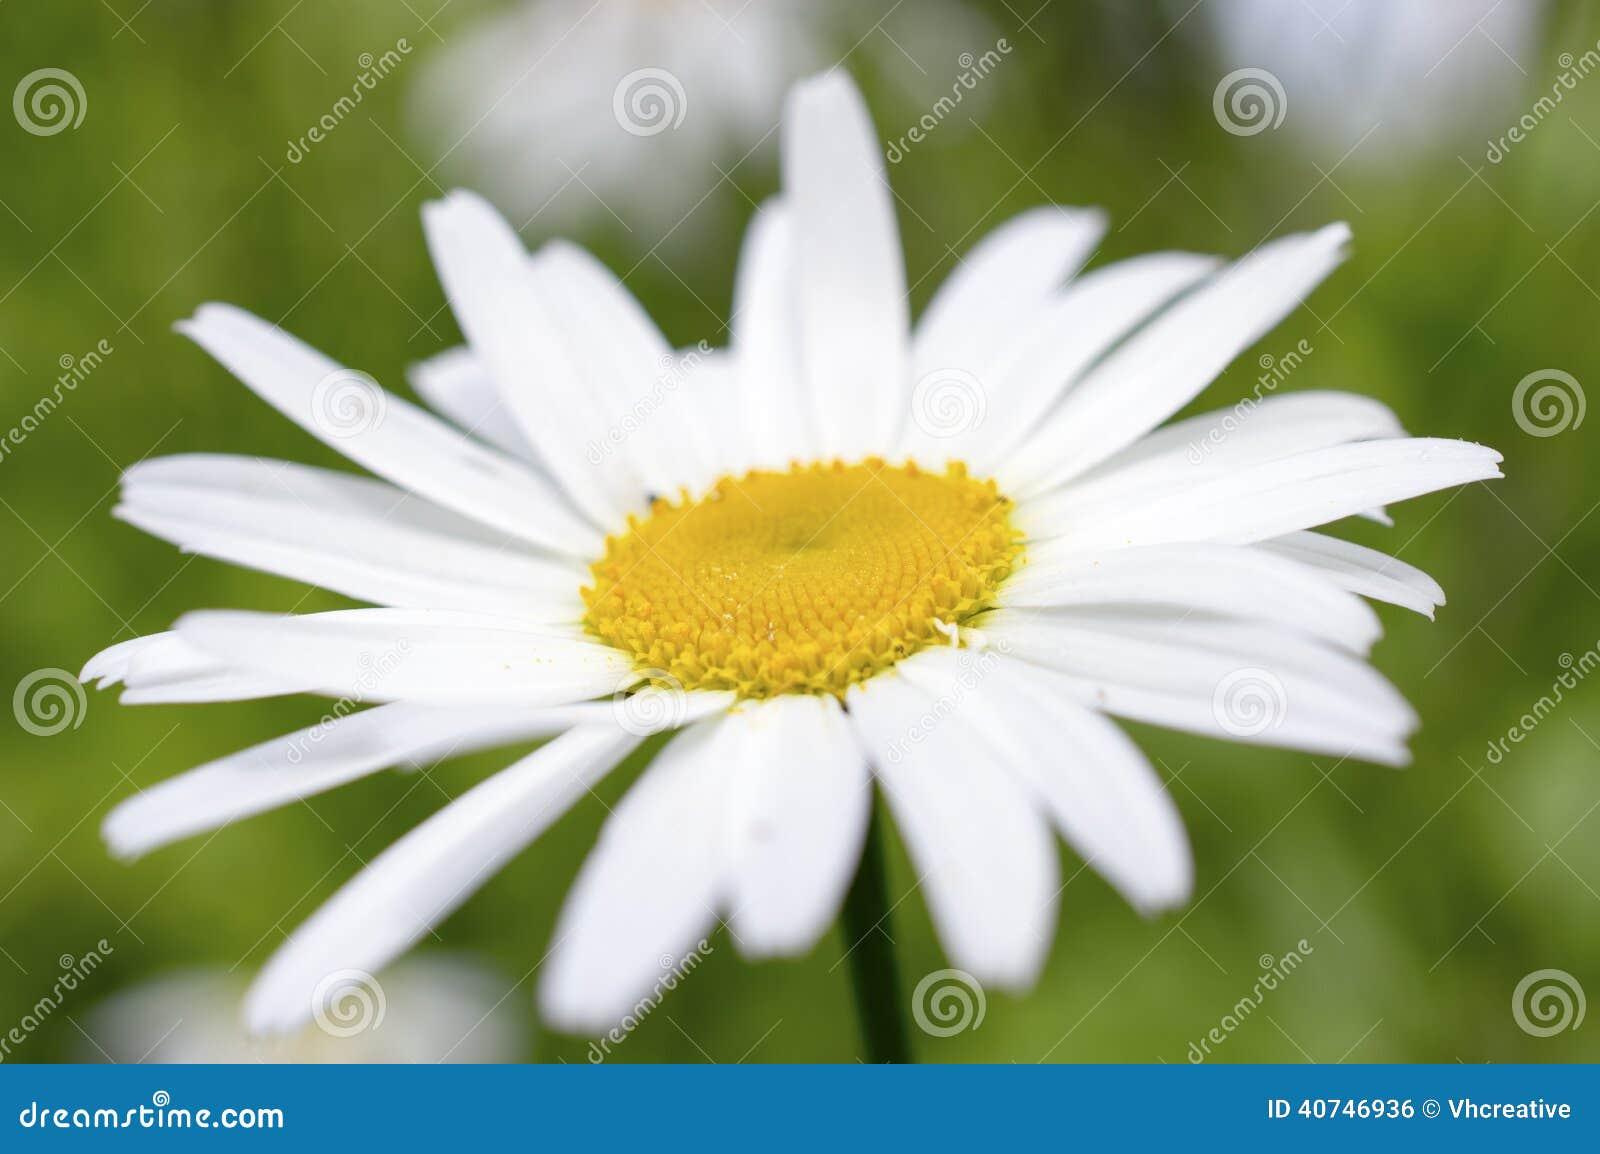 White Daisy Like Chamomile Flower Stock Photo Image Of Petals